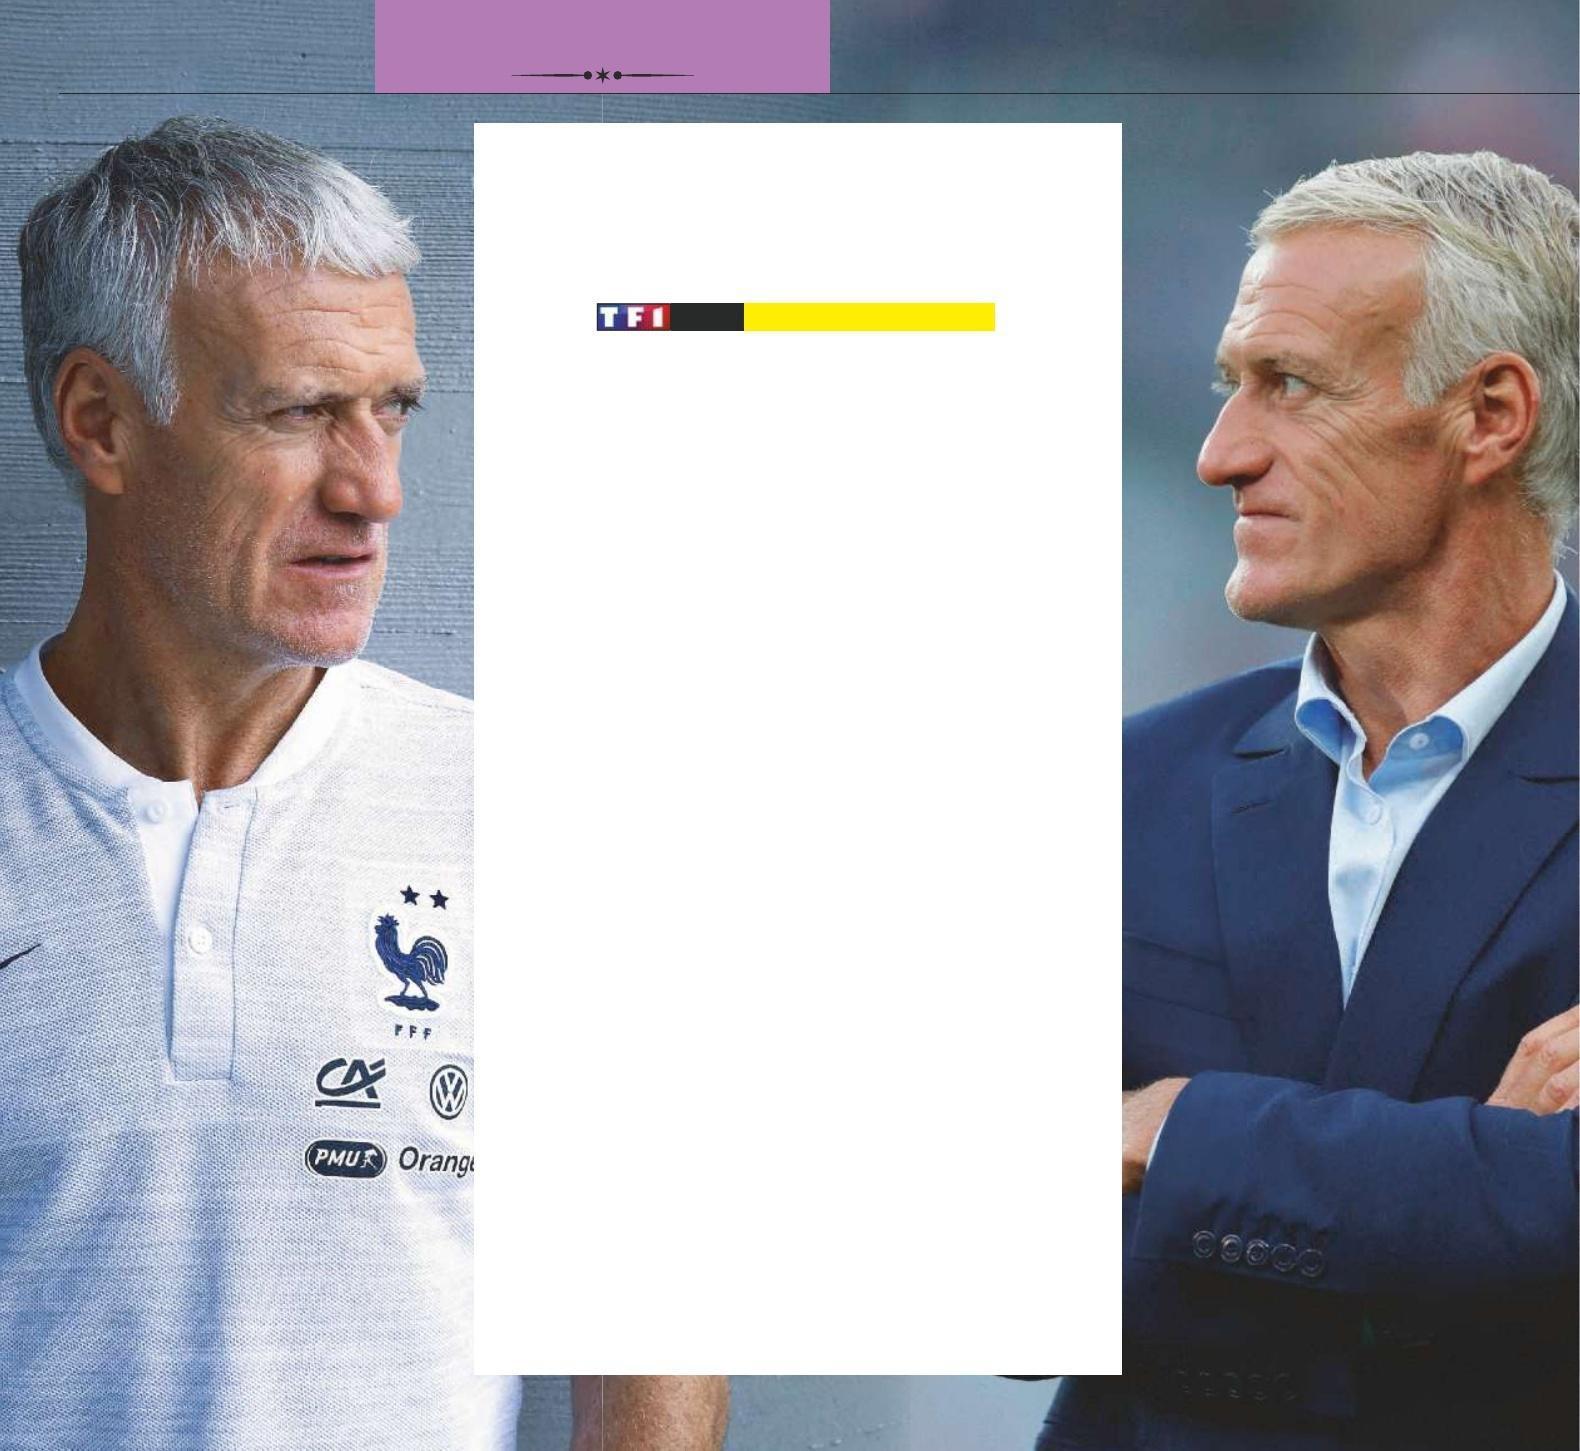 Interview Frédéric Lohézic,ALAIN MOUNIC/MARTIN RICHARD/PRESSE SPORTS